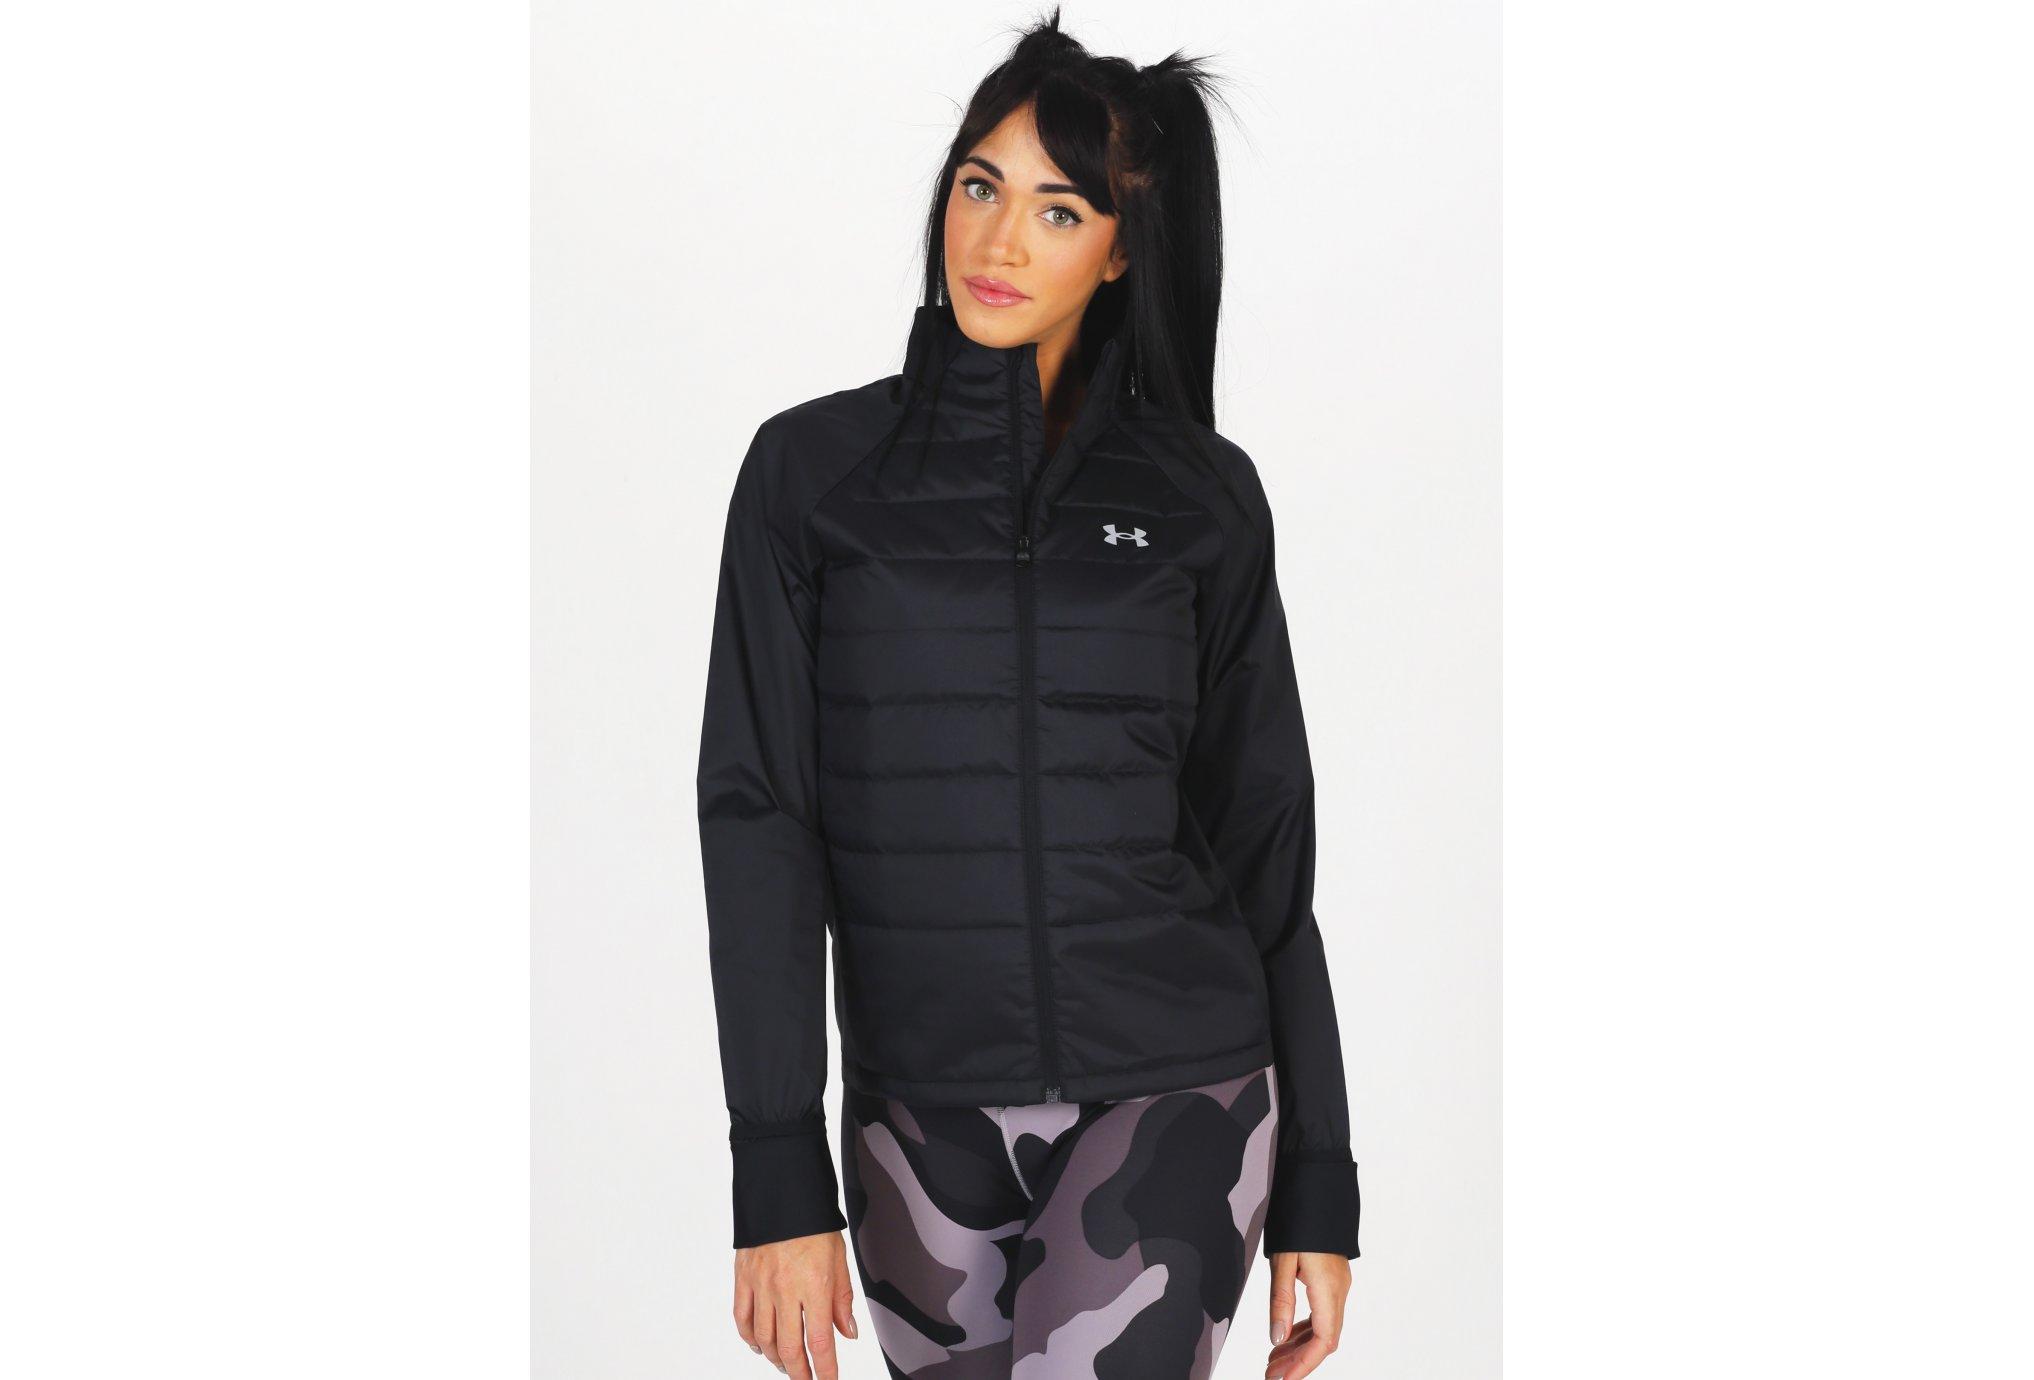 Under Armour Run Insulate Hybrid W Diététique Vêtements femme